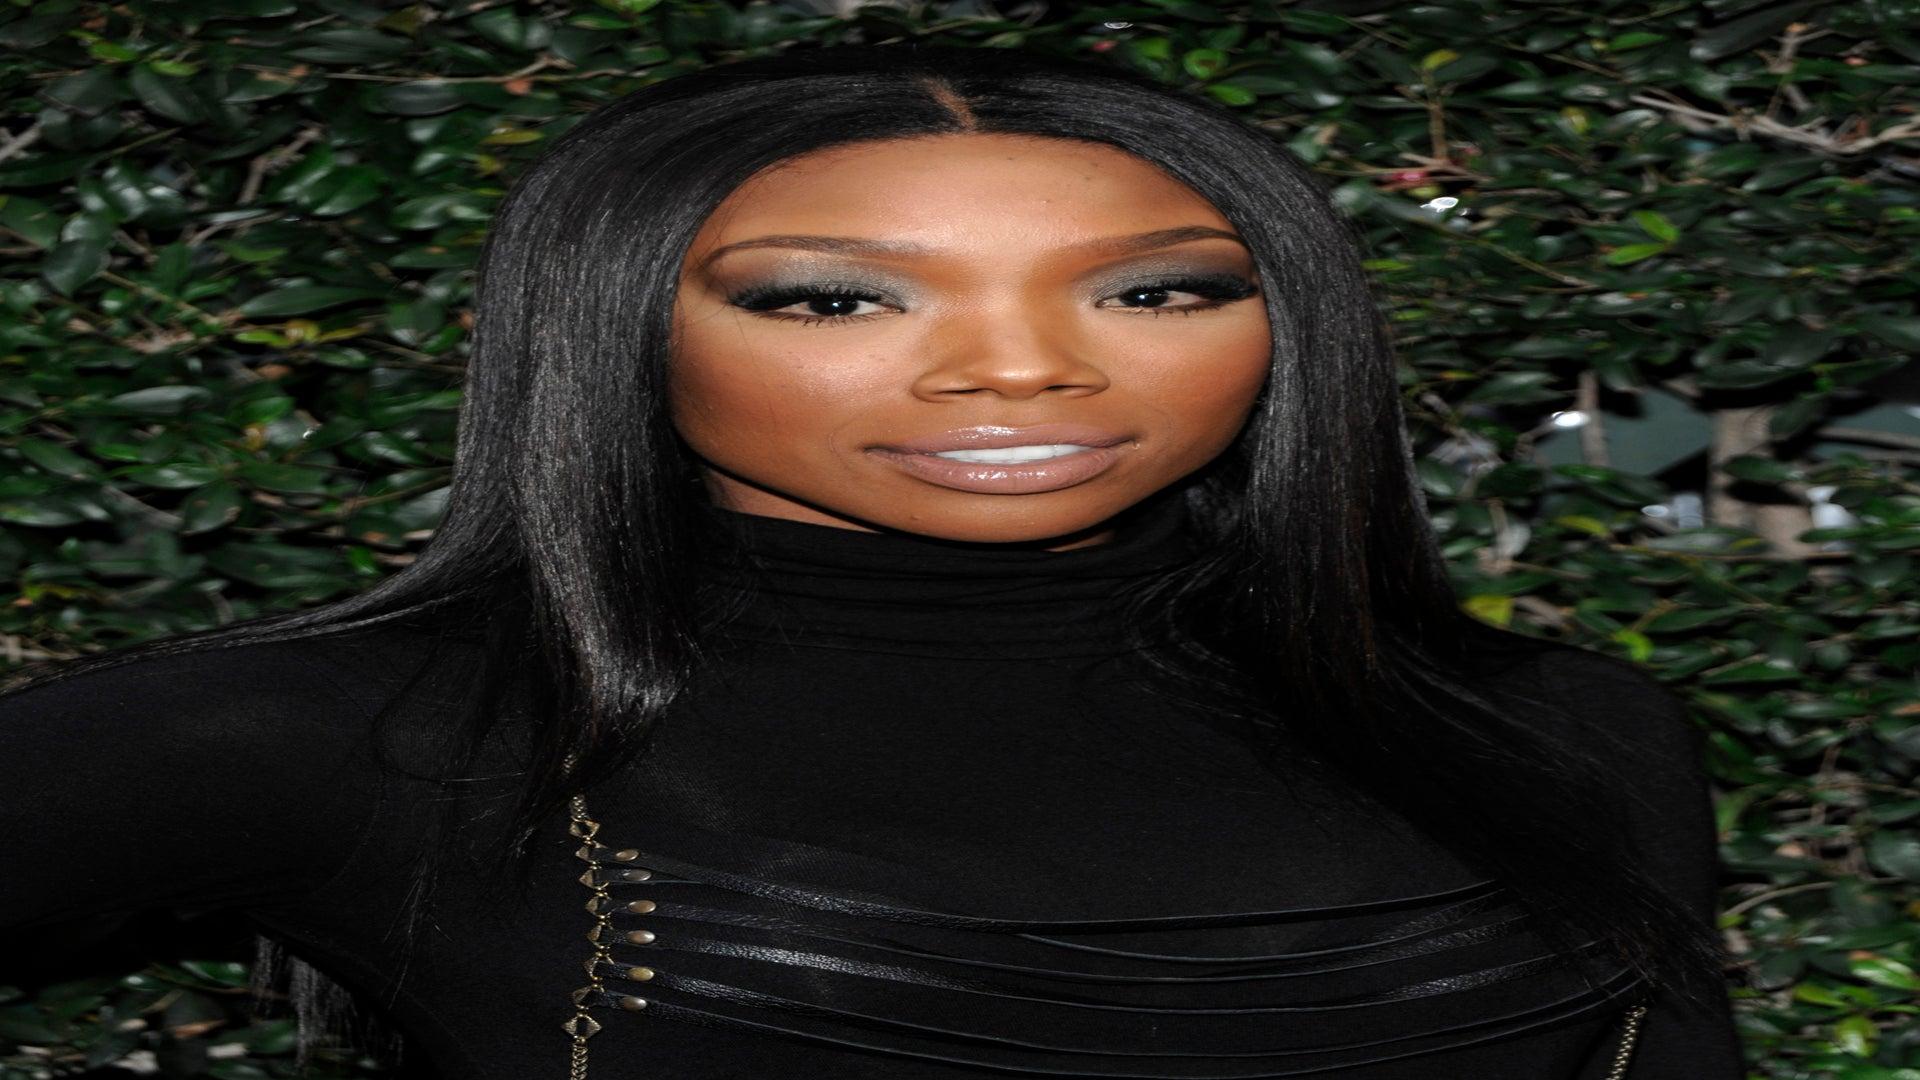 Brandy Addresses Twitter Negativity Surrounding Fatal Car Crash